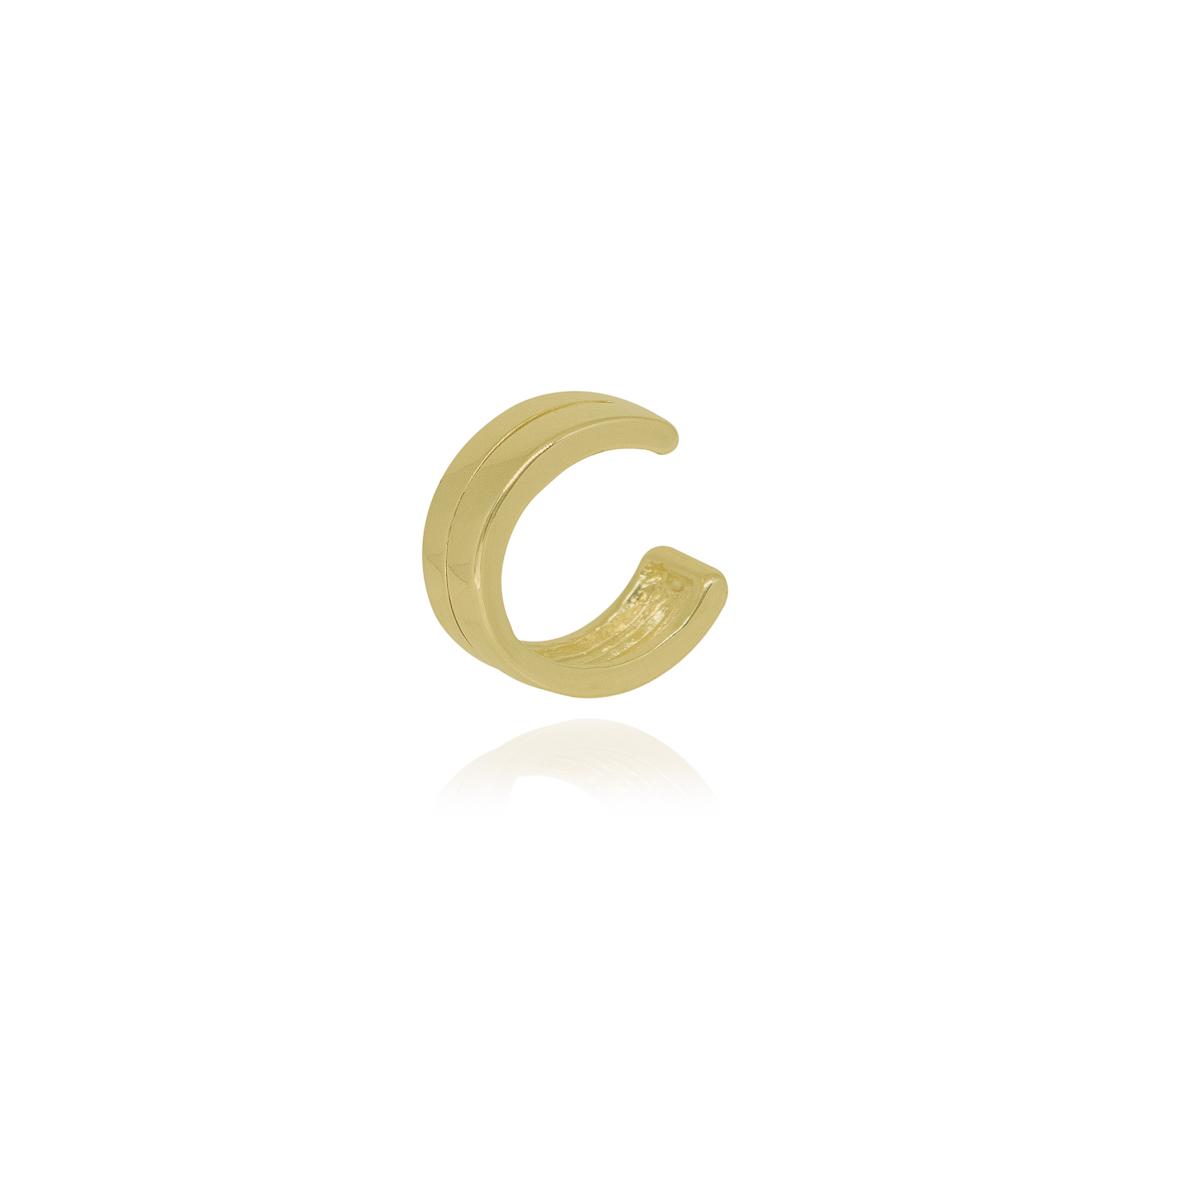 Piercing fake semijoia feixe central folheado ouro ou ródio